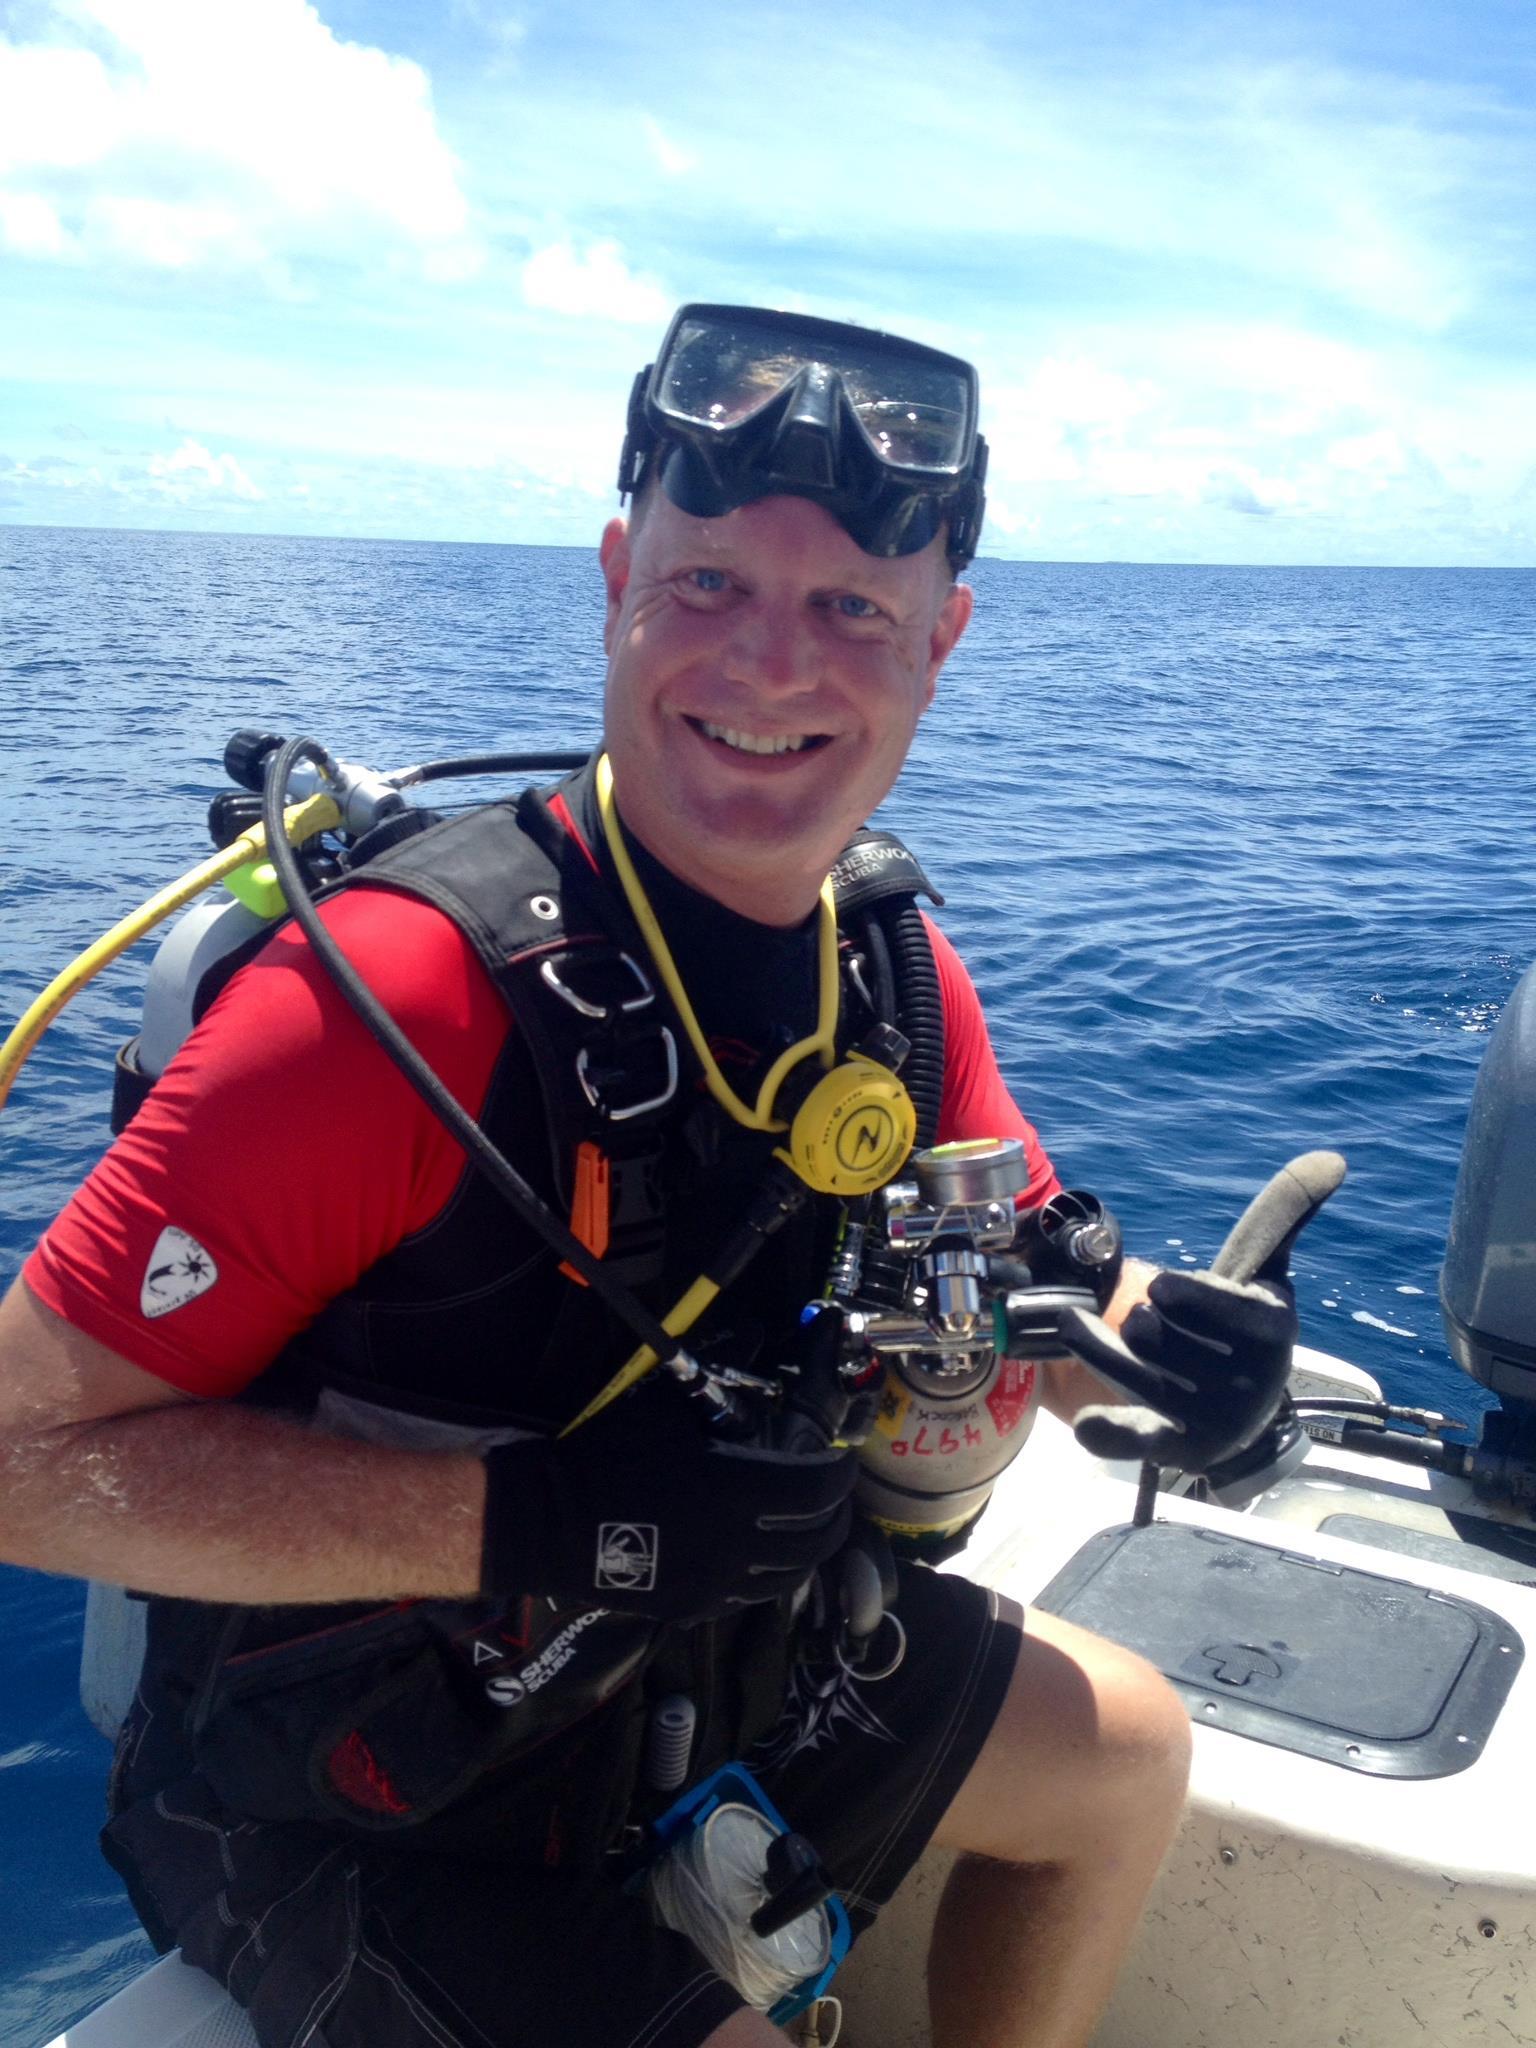 Dan Farnham, explorer and author, based in Kwajalein Atoll.